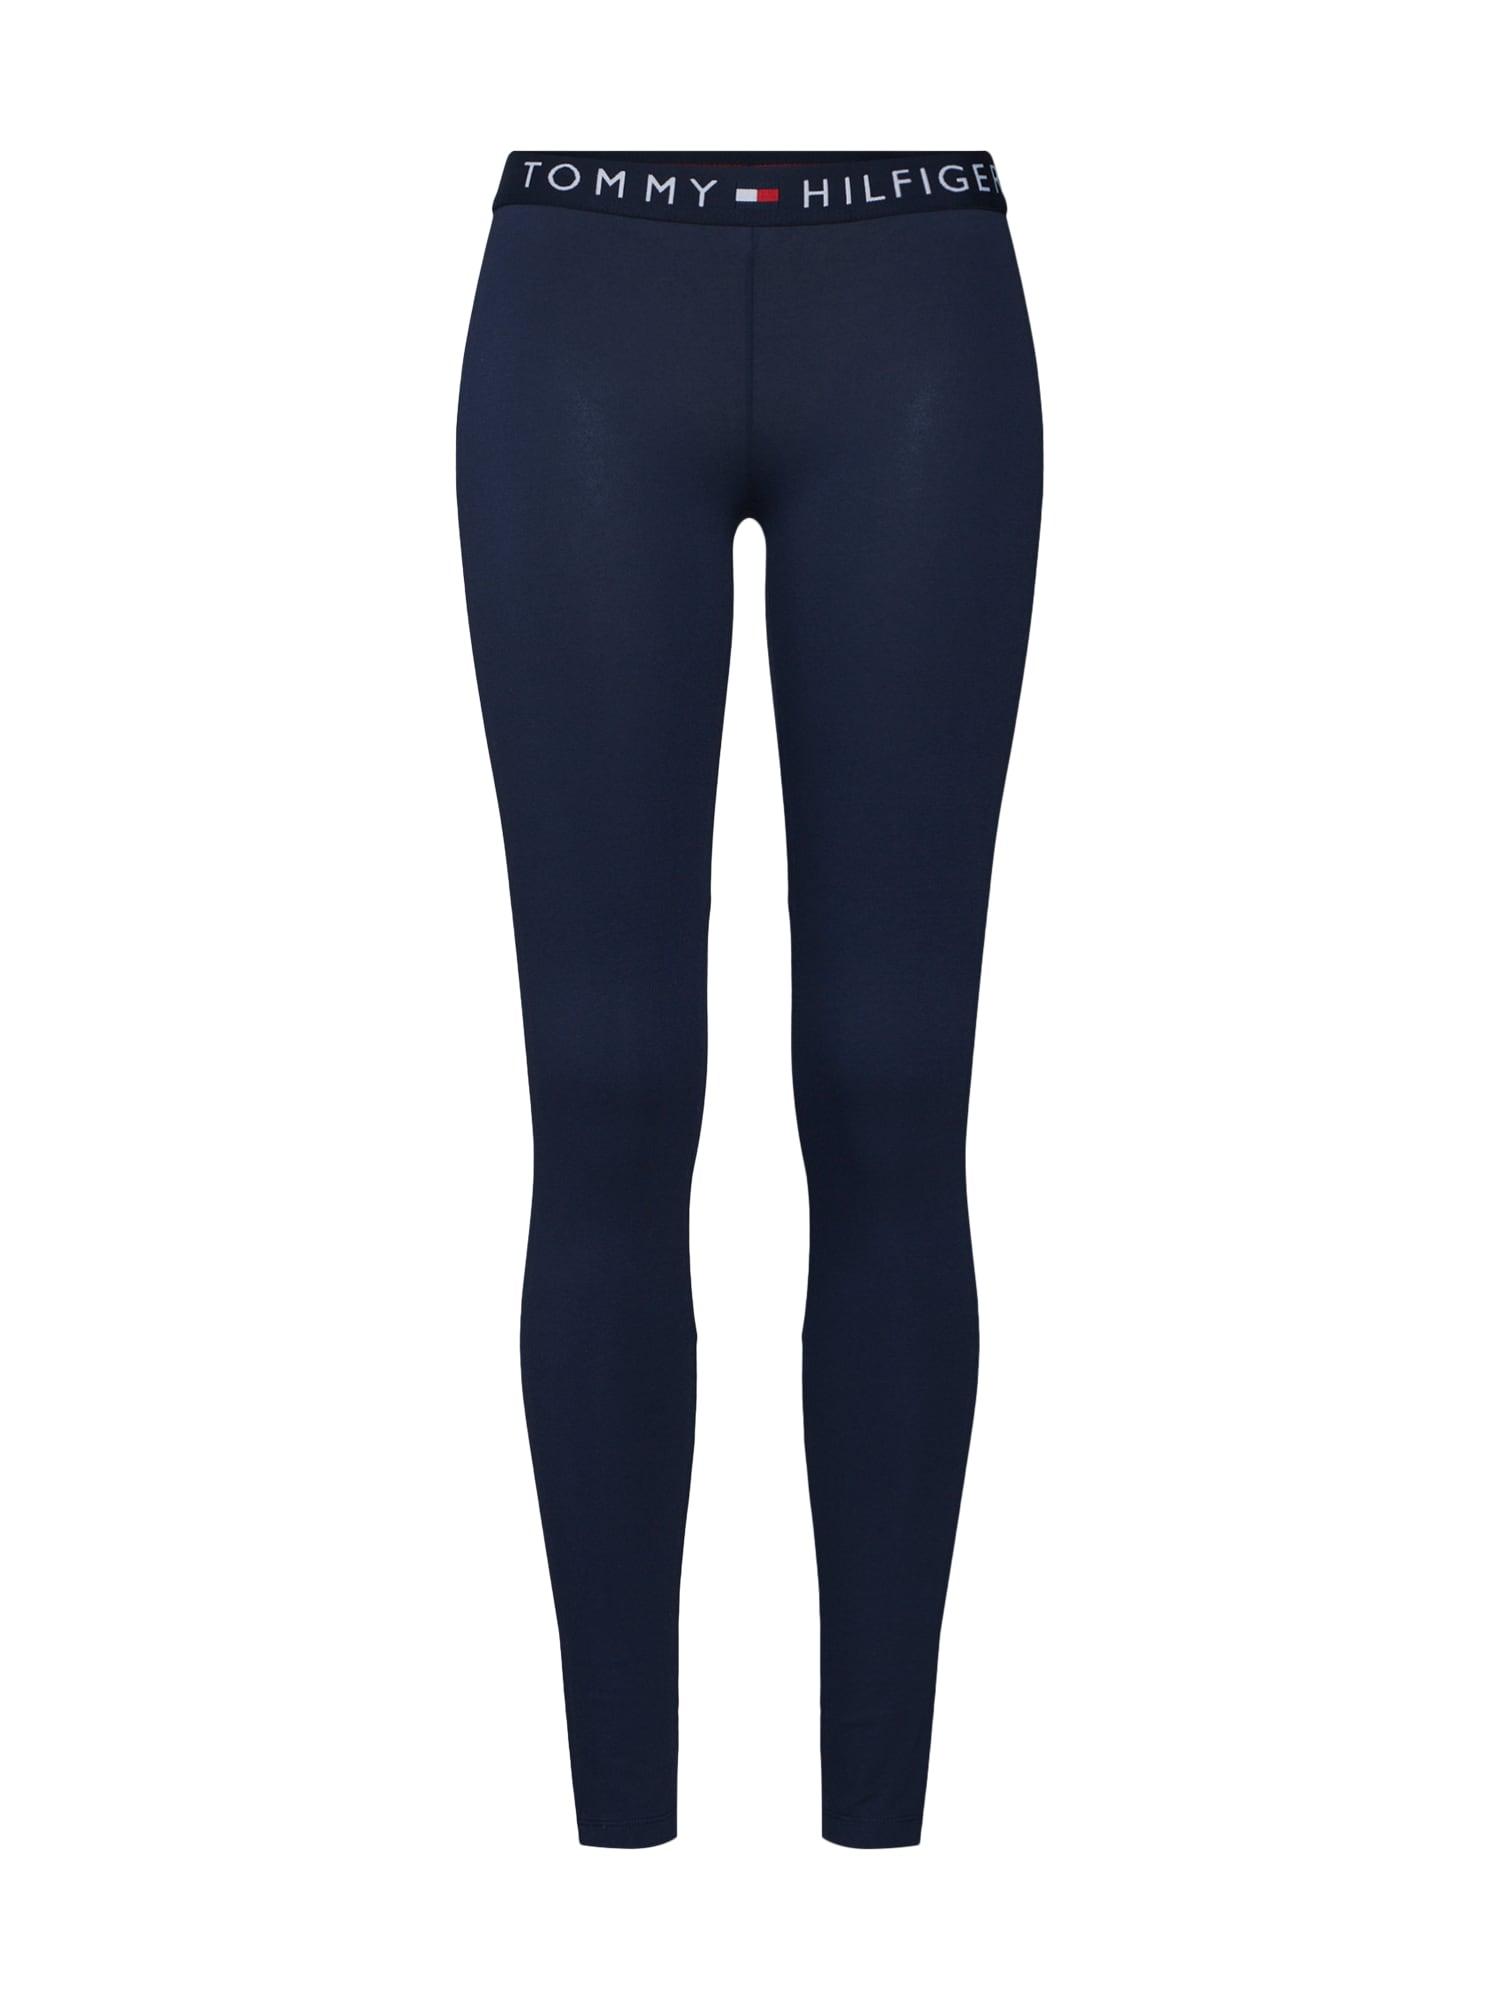 Tommy Hilfiger Underwear Pižaminės kelnės tamsiai mėlyna